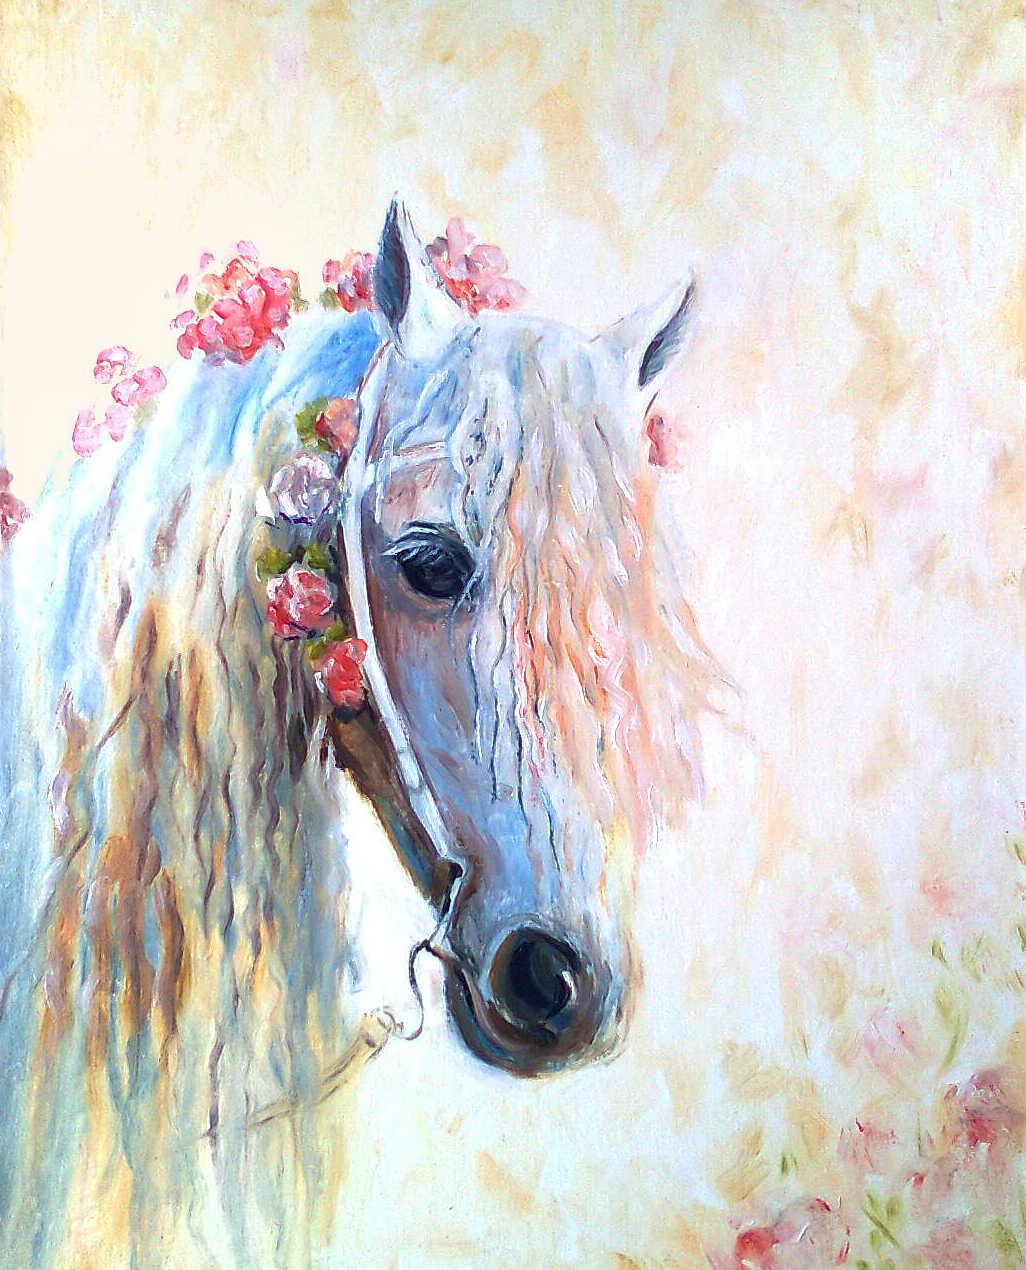 картина цветочная лошадка холст масло